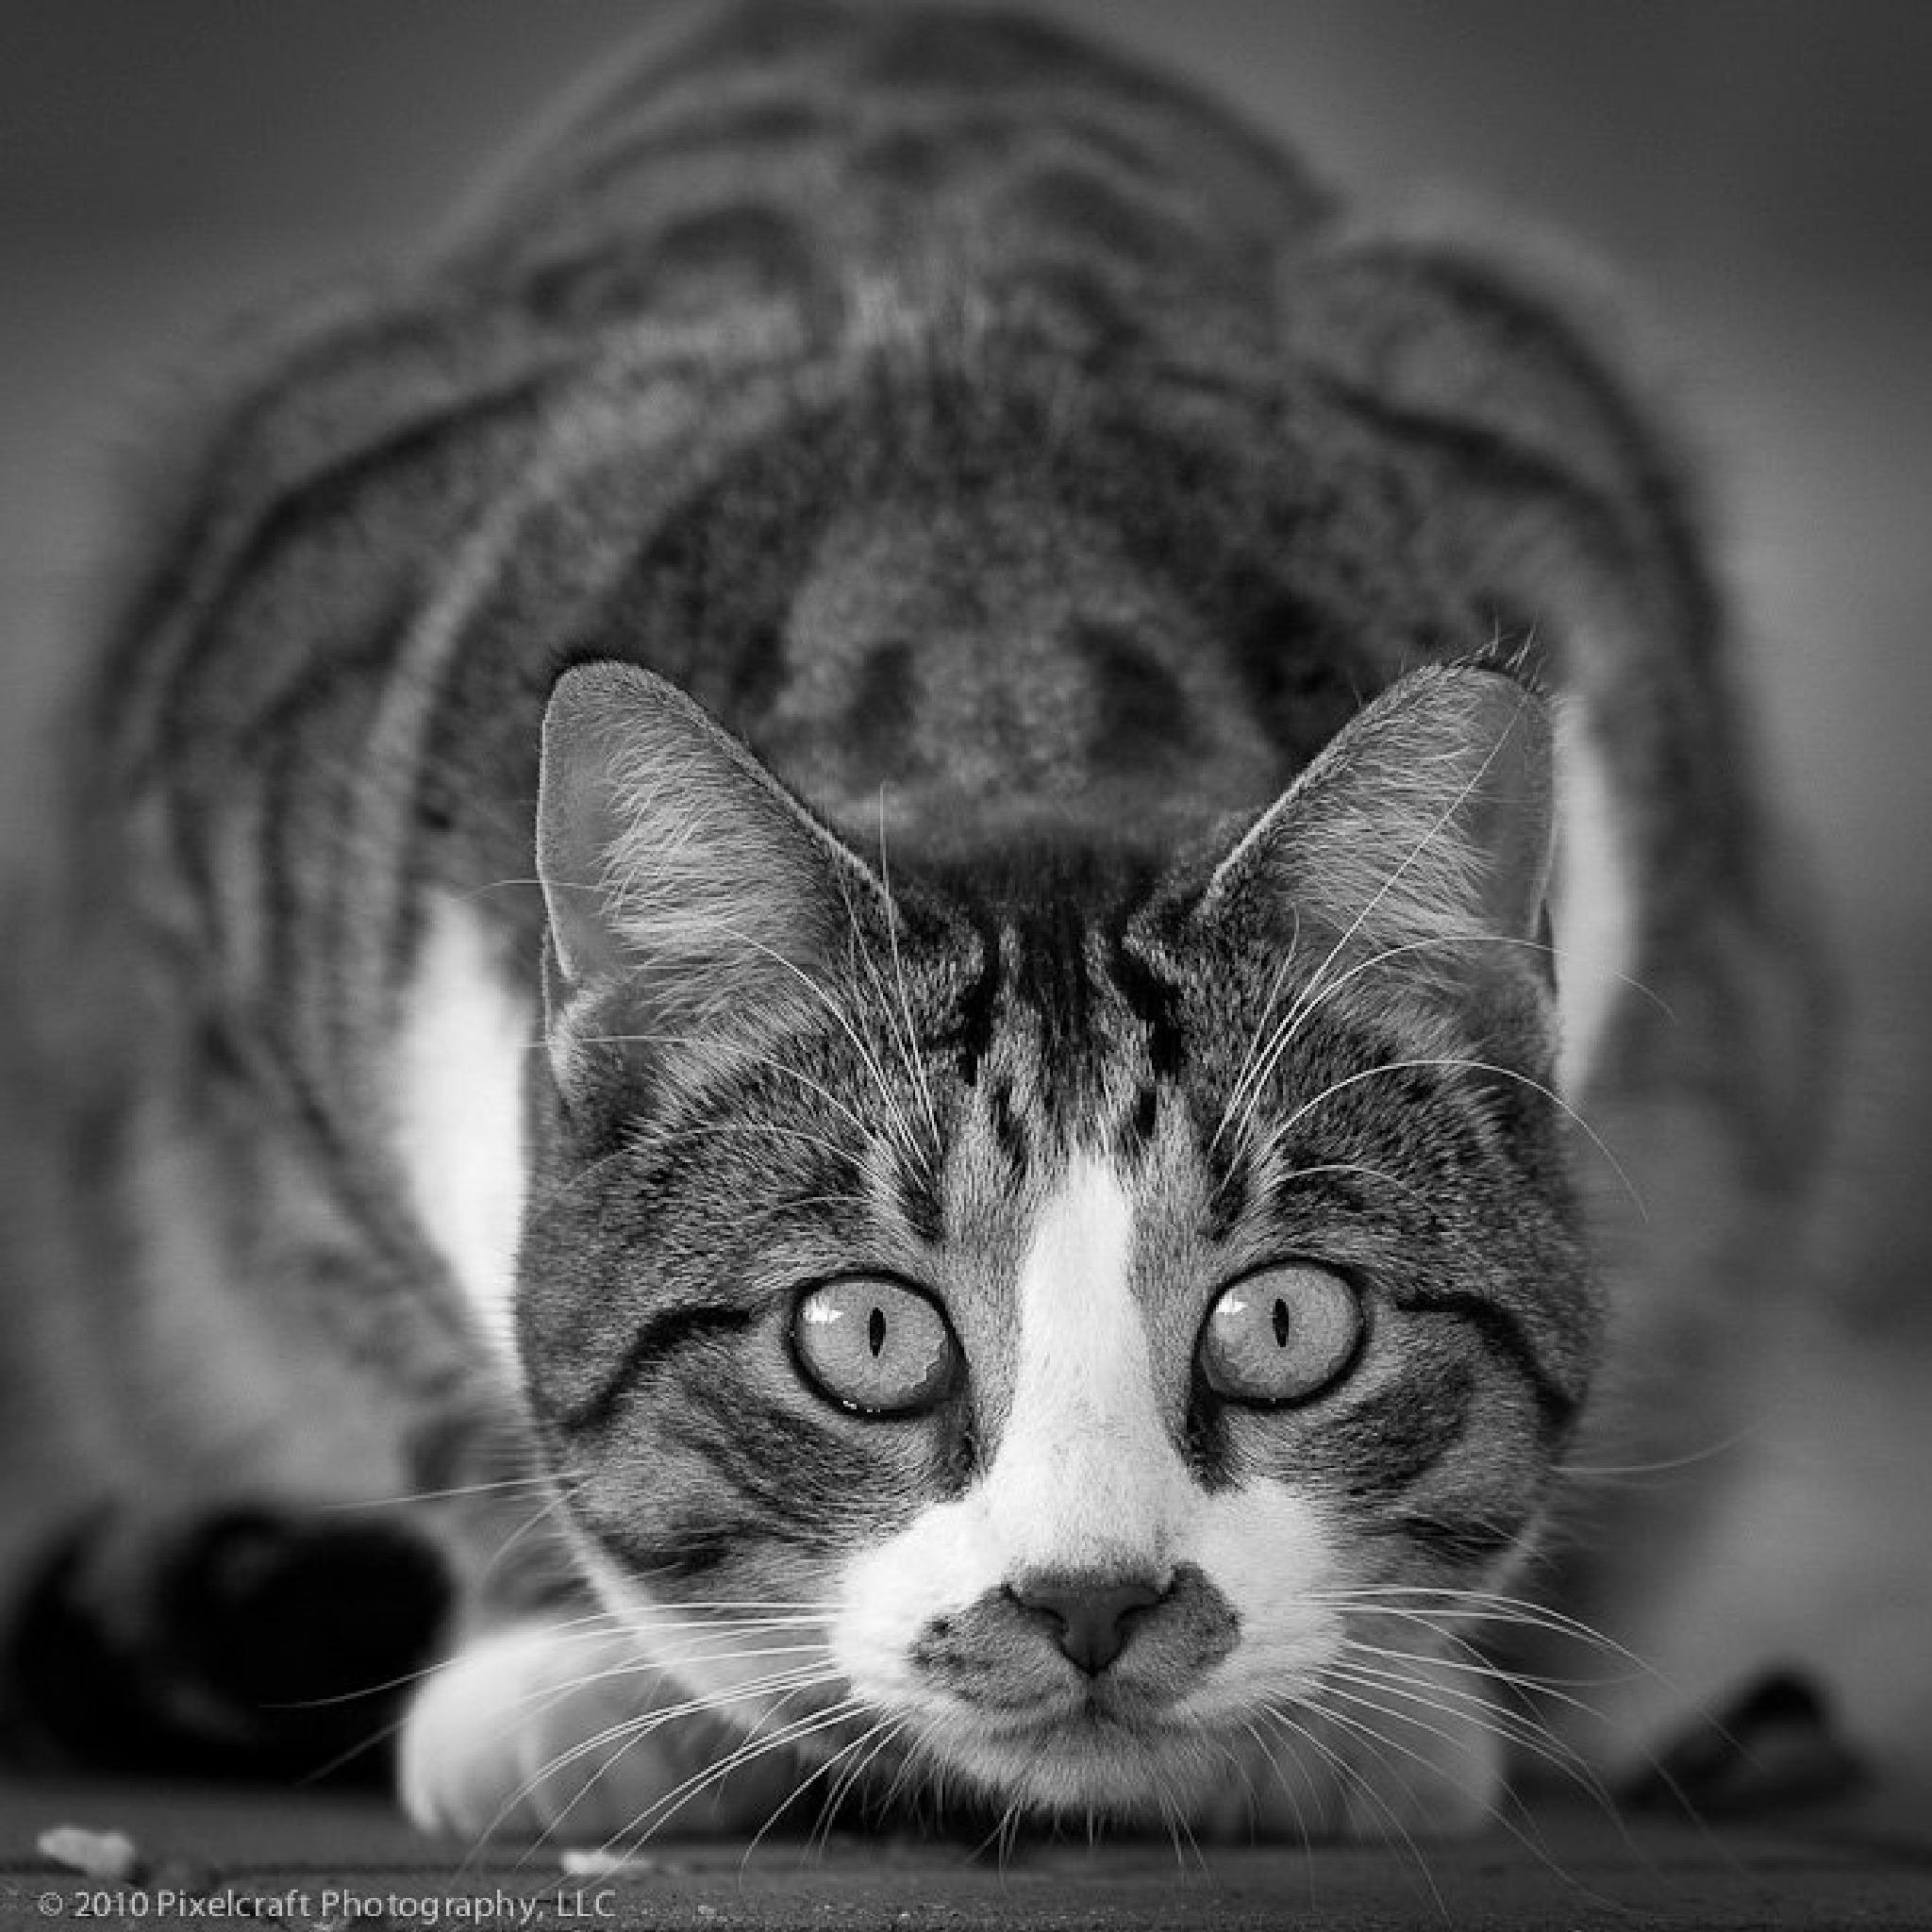 Eye to Eye by RonaldSill